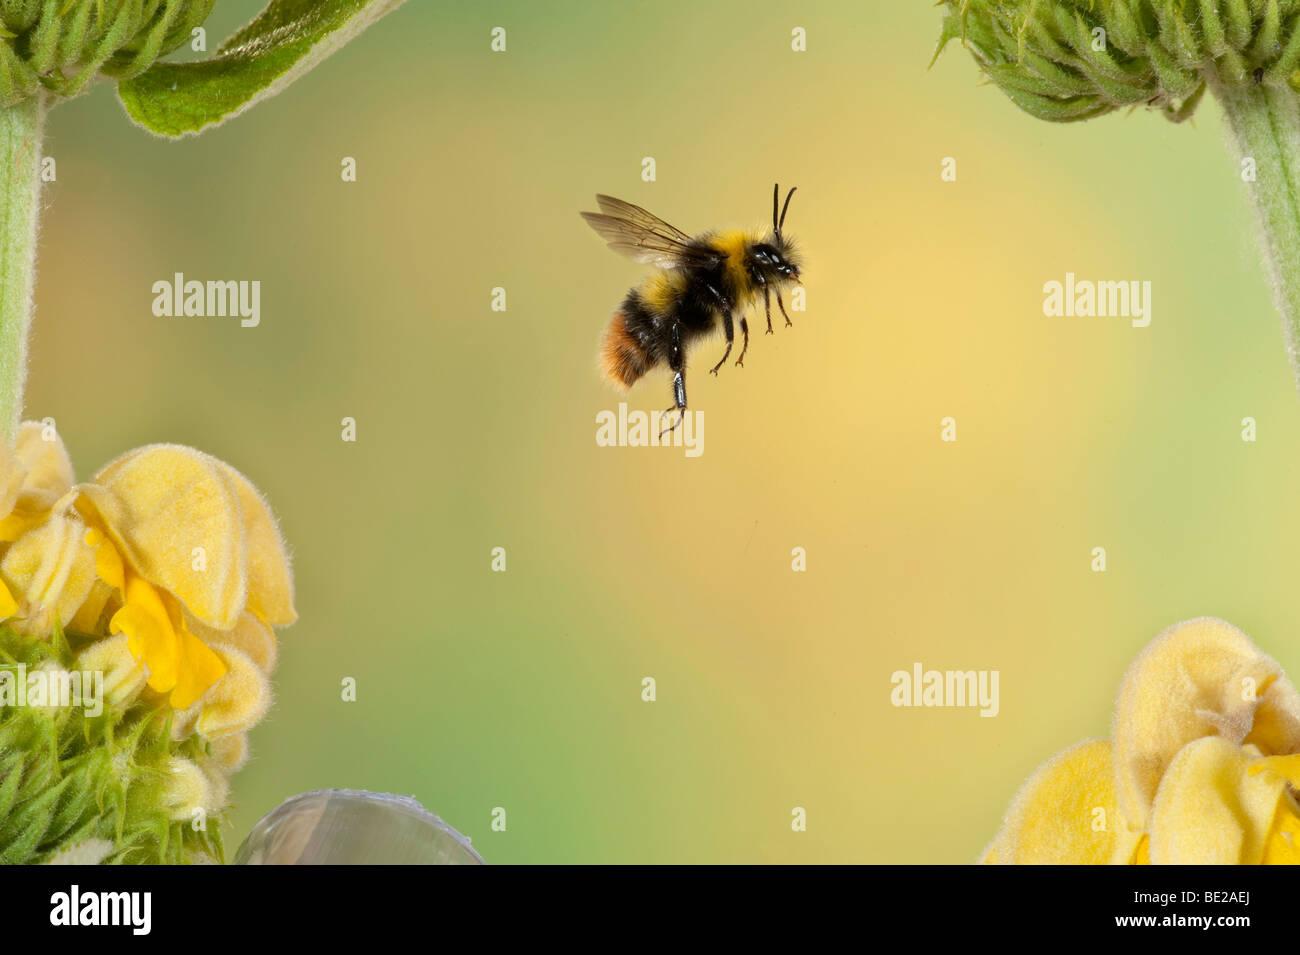 red tailed bumble bee bombus pratorum in flight free flying